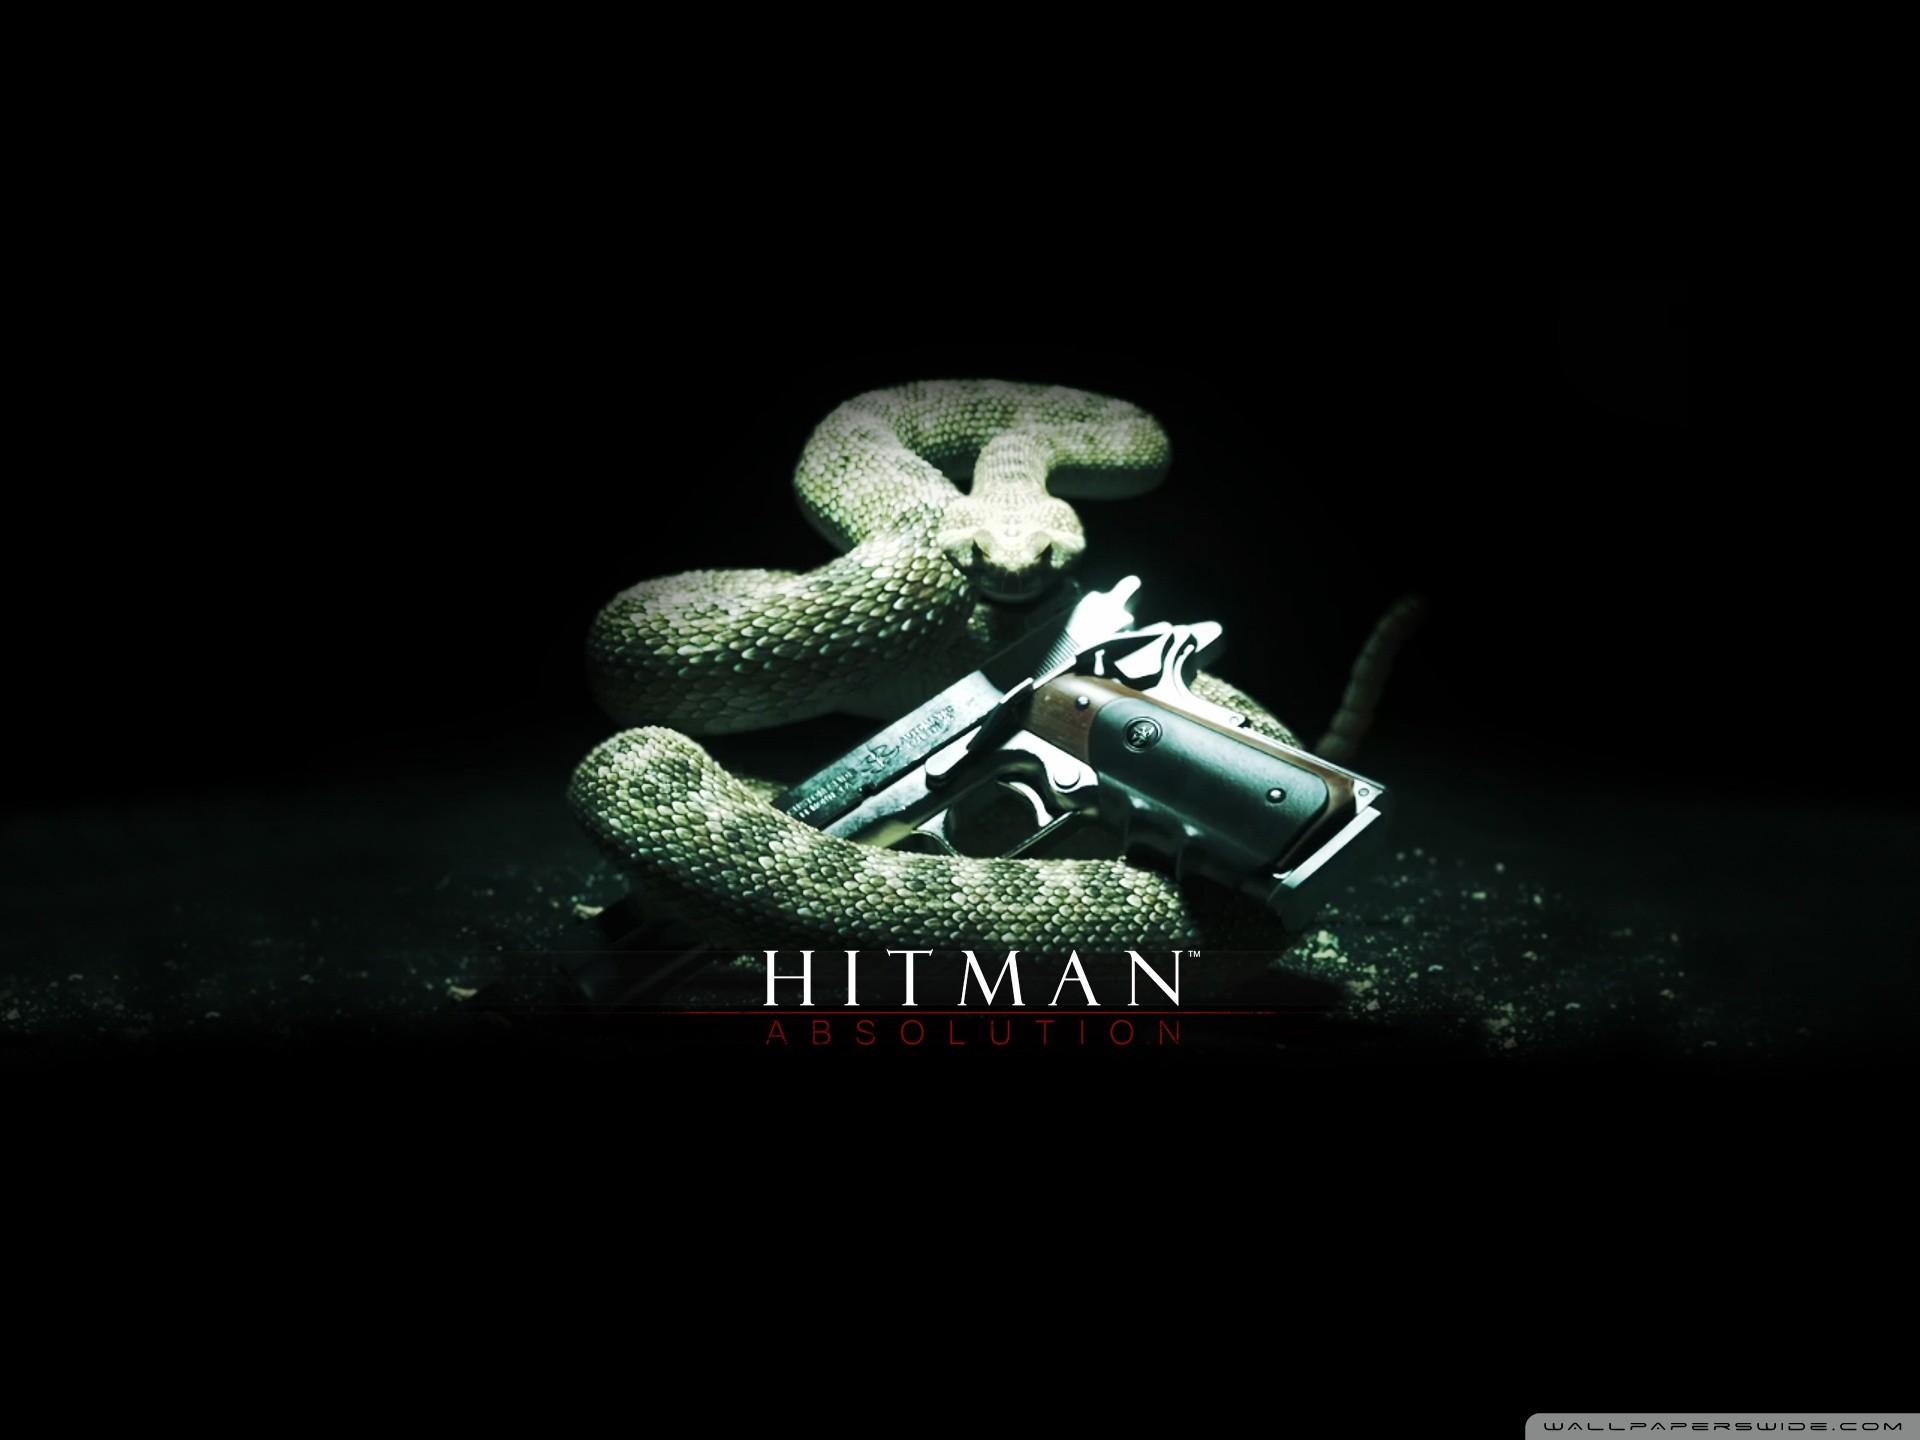 Hitman 5: Absolution HD Wide Wallpaper for Widescreen